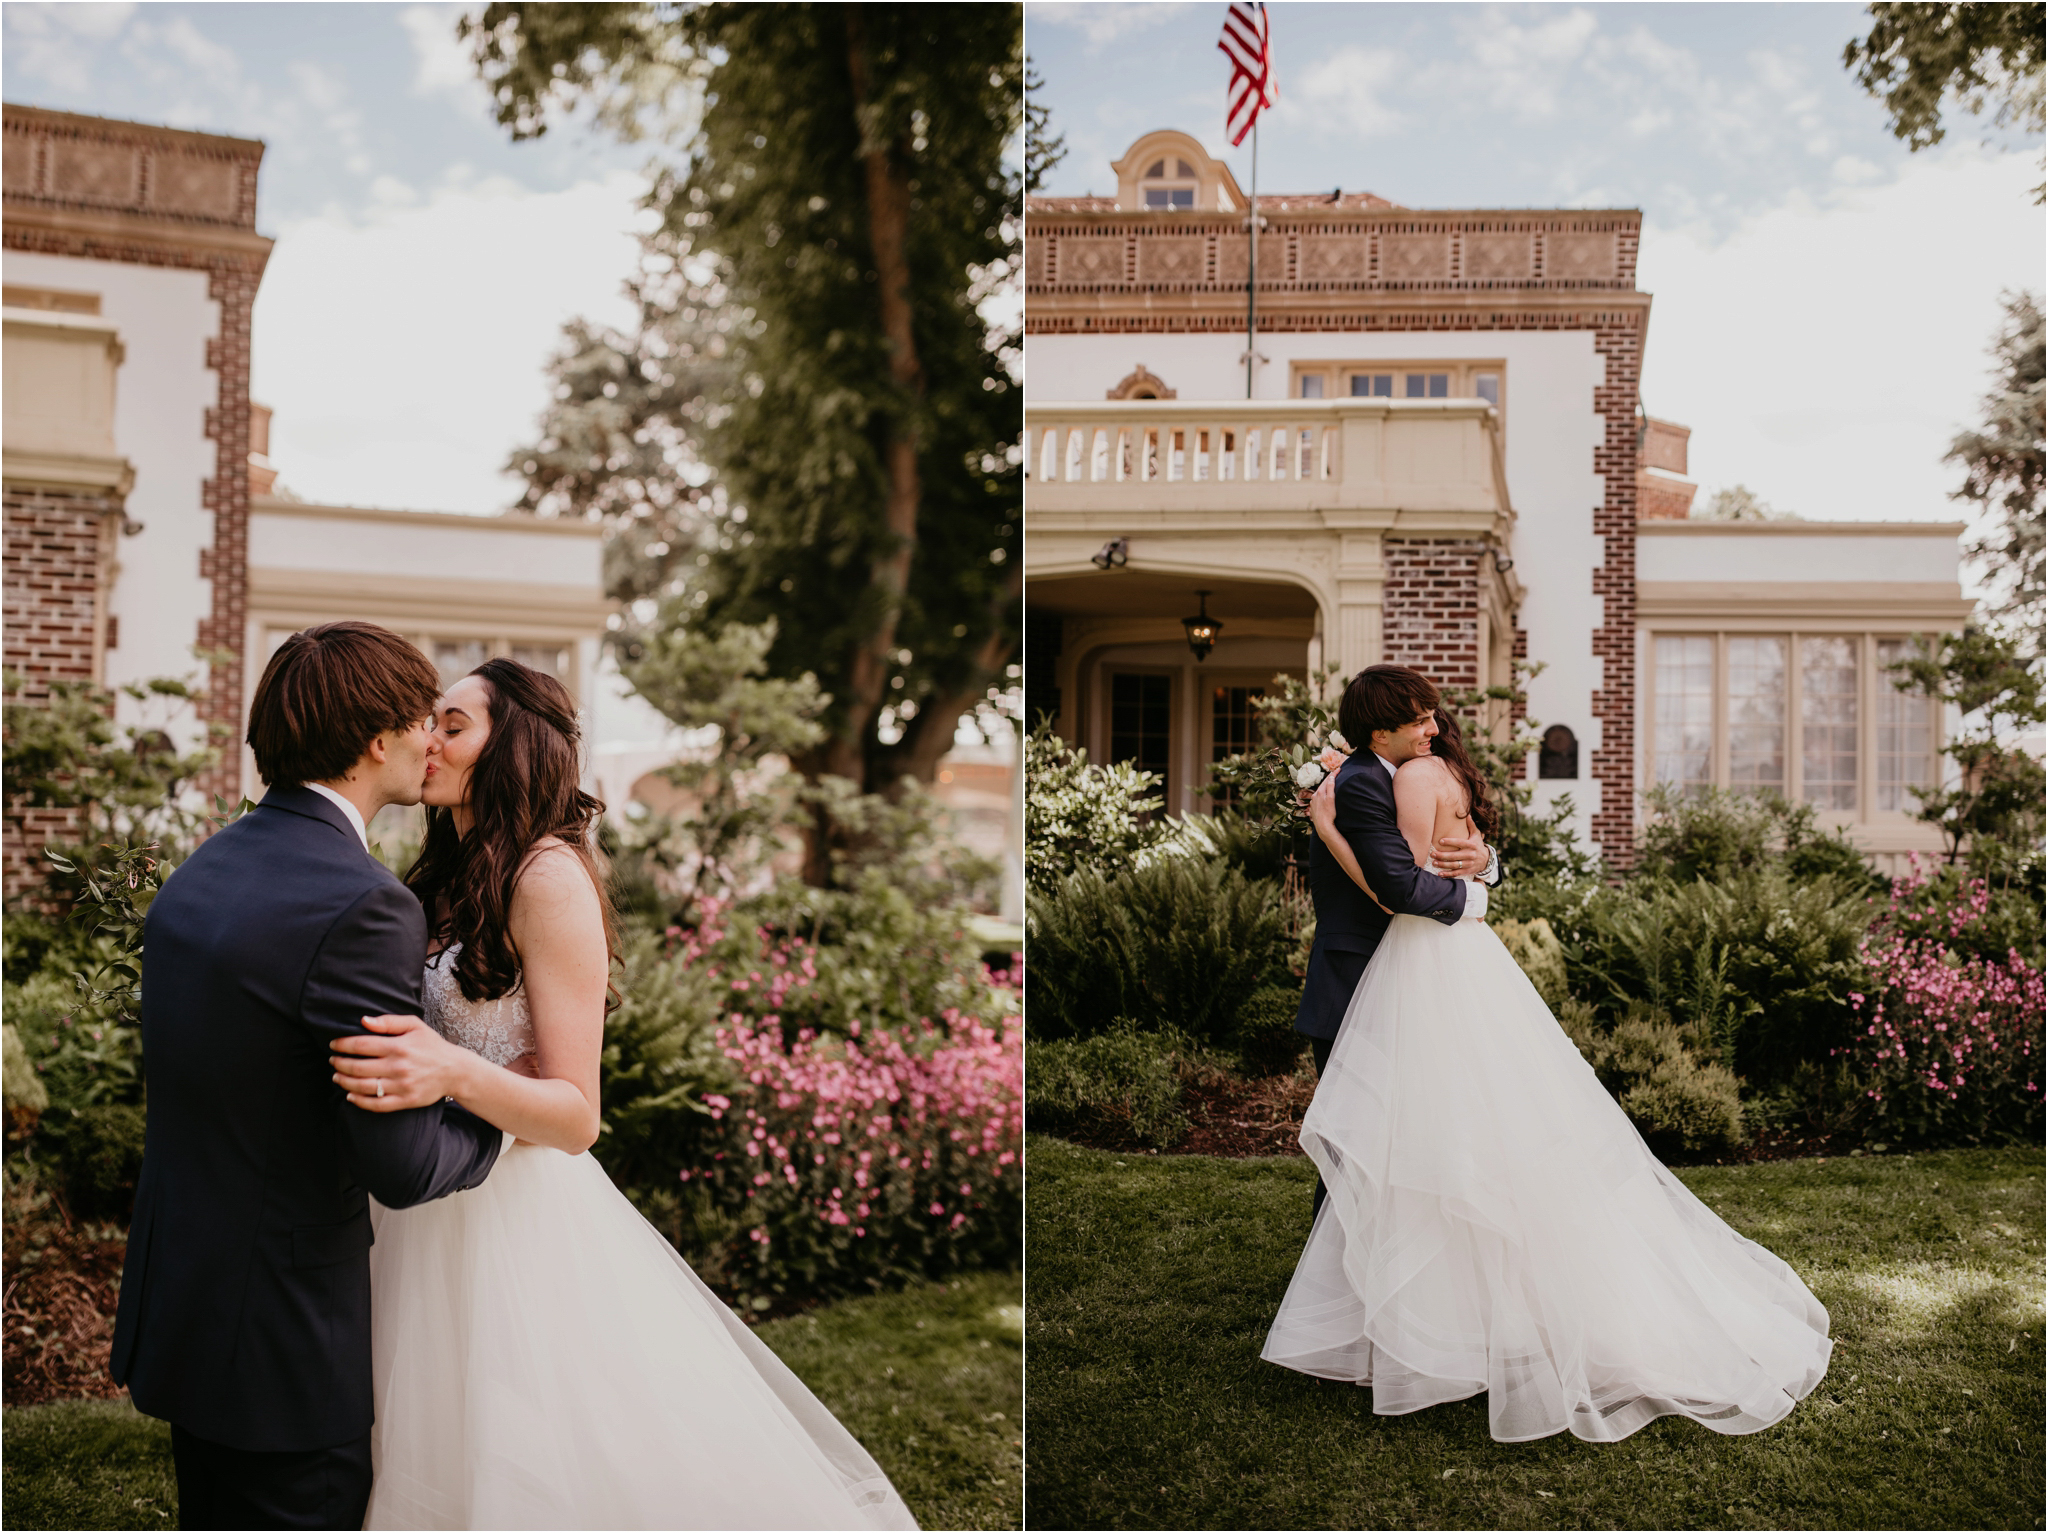 chance-and-ondrea-lairmont-manor-wedding-seattle-photographer-030.jpg